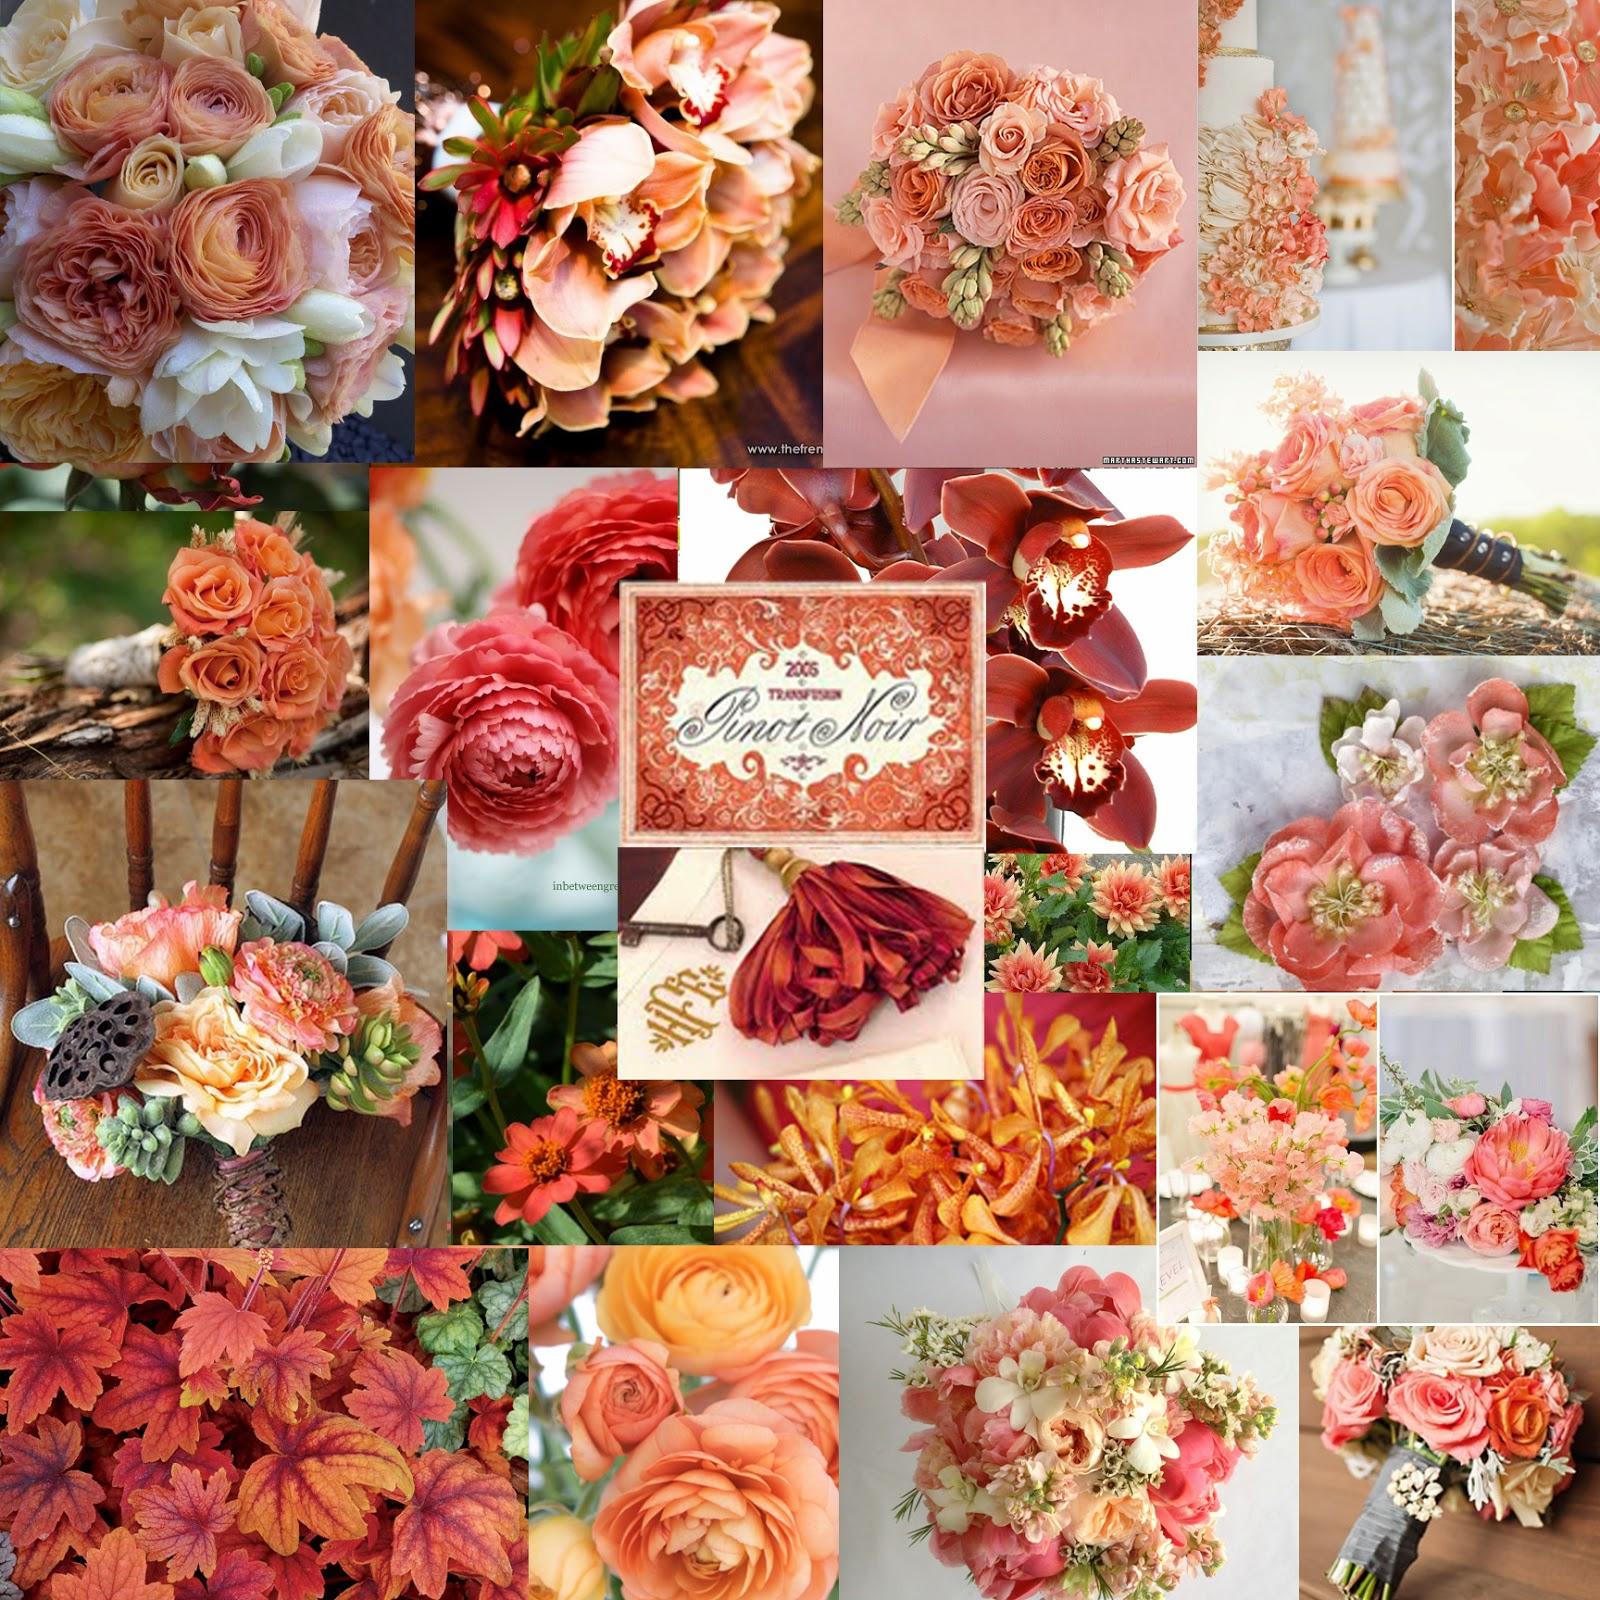 Pinterest Wedding Ideas 2014: The Autumn Wedding: Wedding Colours